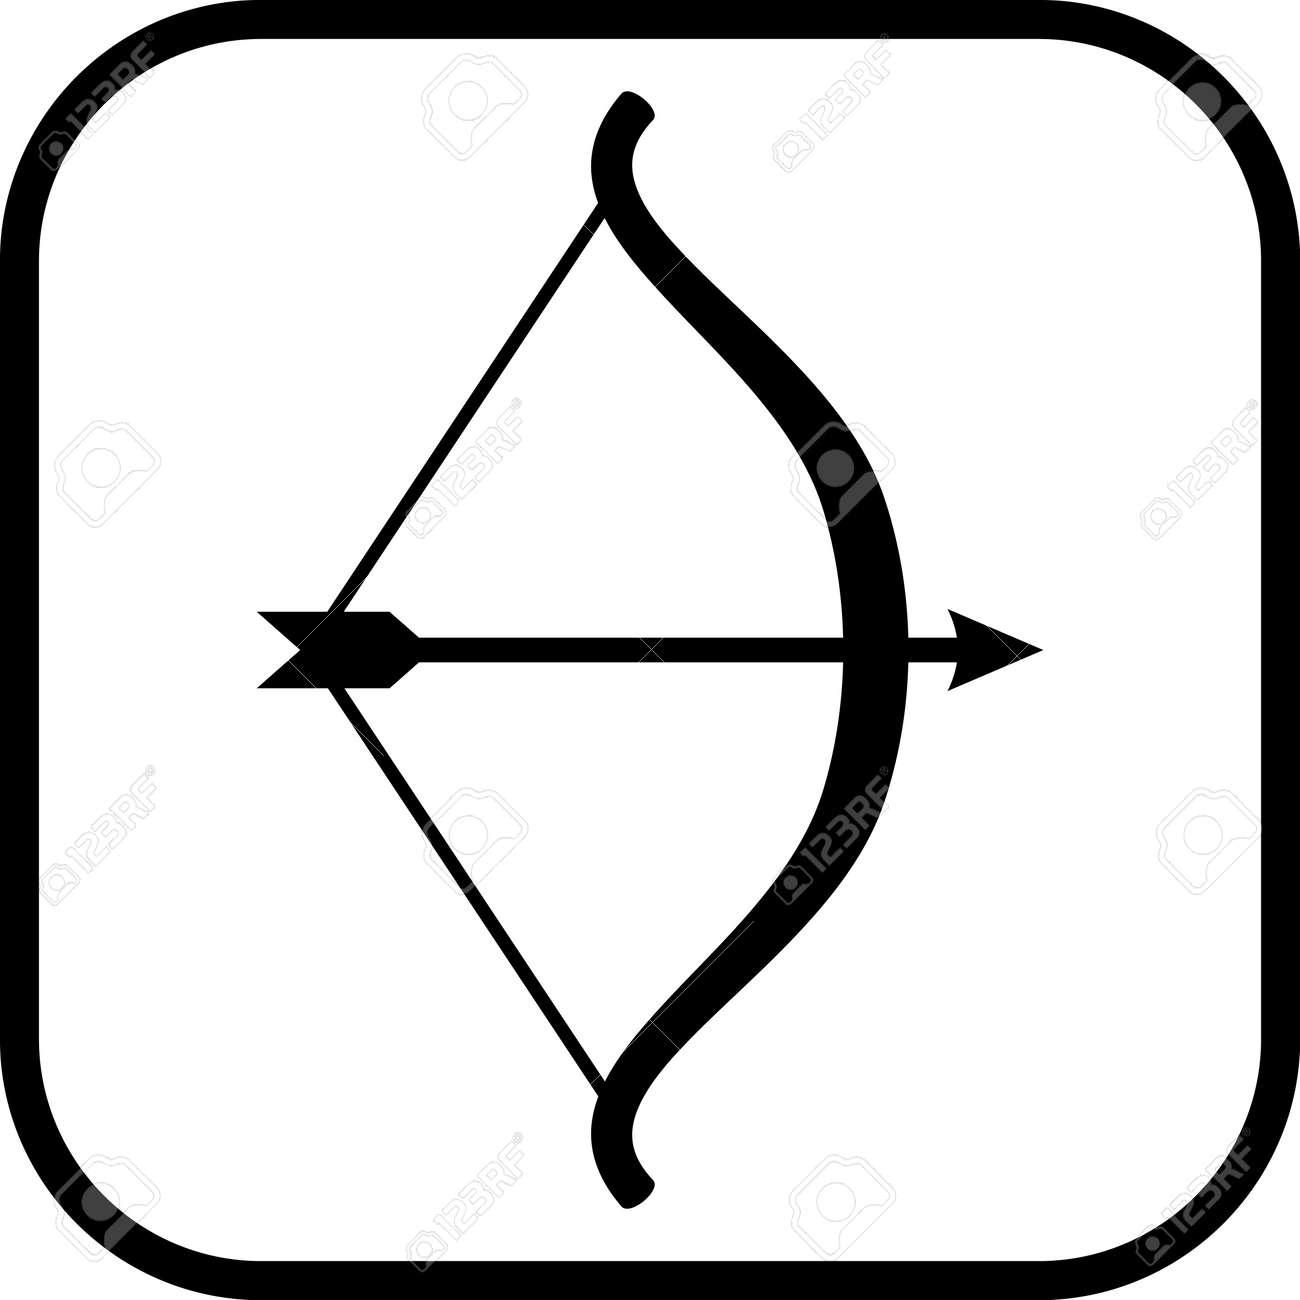 bow and arrow vector icon isolated royalty free cliparts vectors rh 123rf com bow and arrow silhouette vector bow and arrow vector images